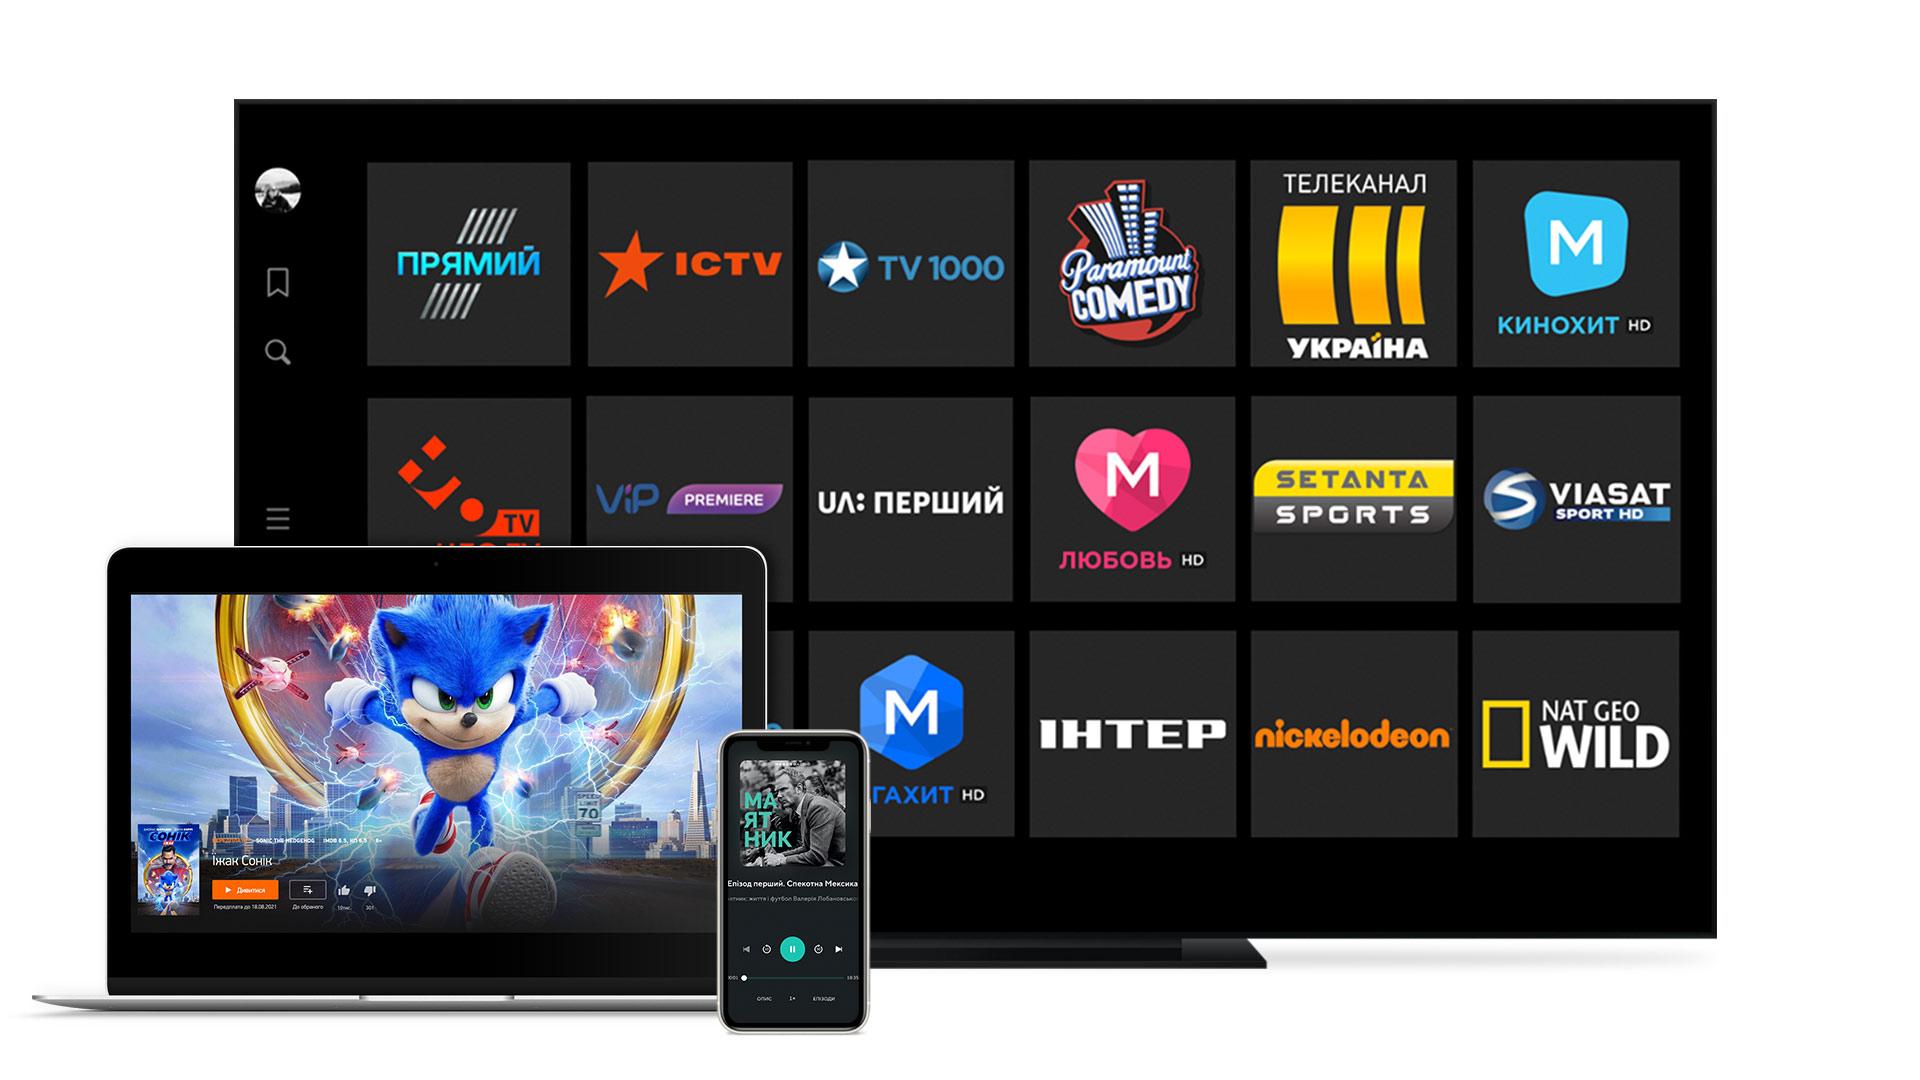 телебачення megogo | netgroup